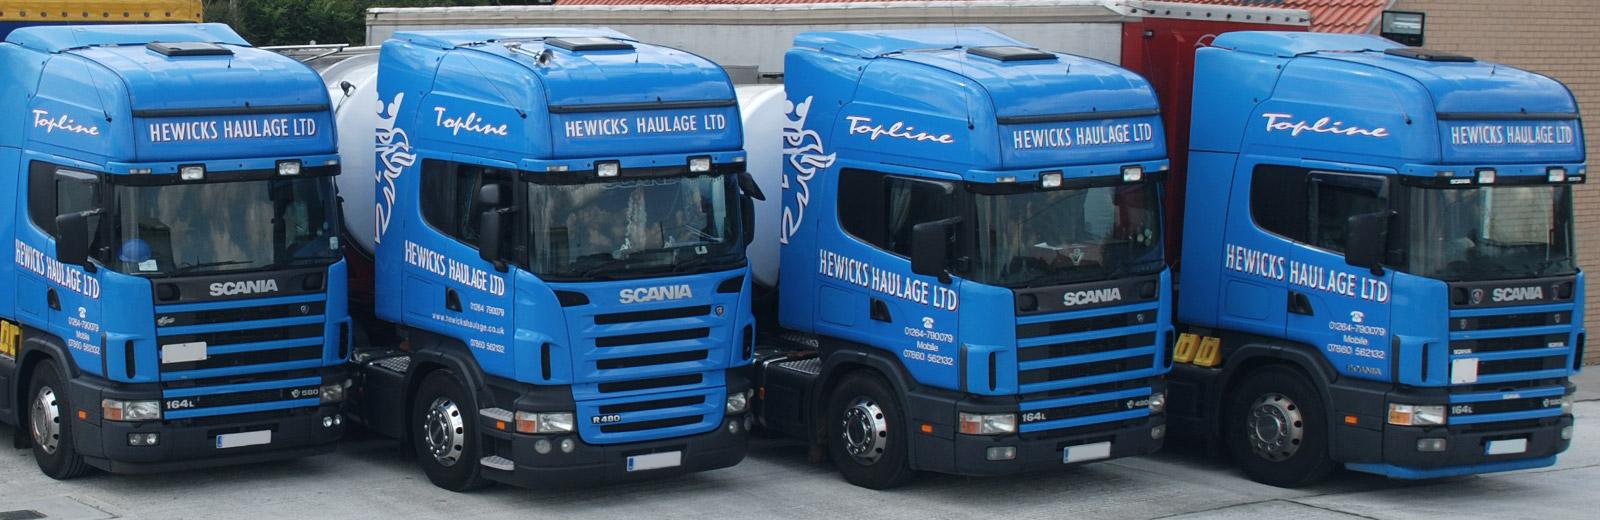 Hewicks Haulage Fleet